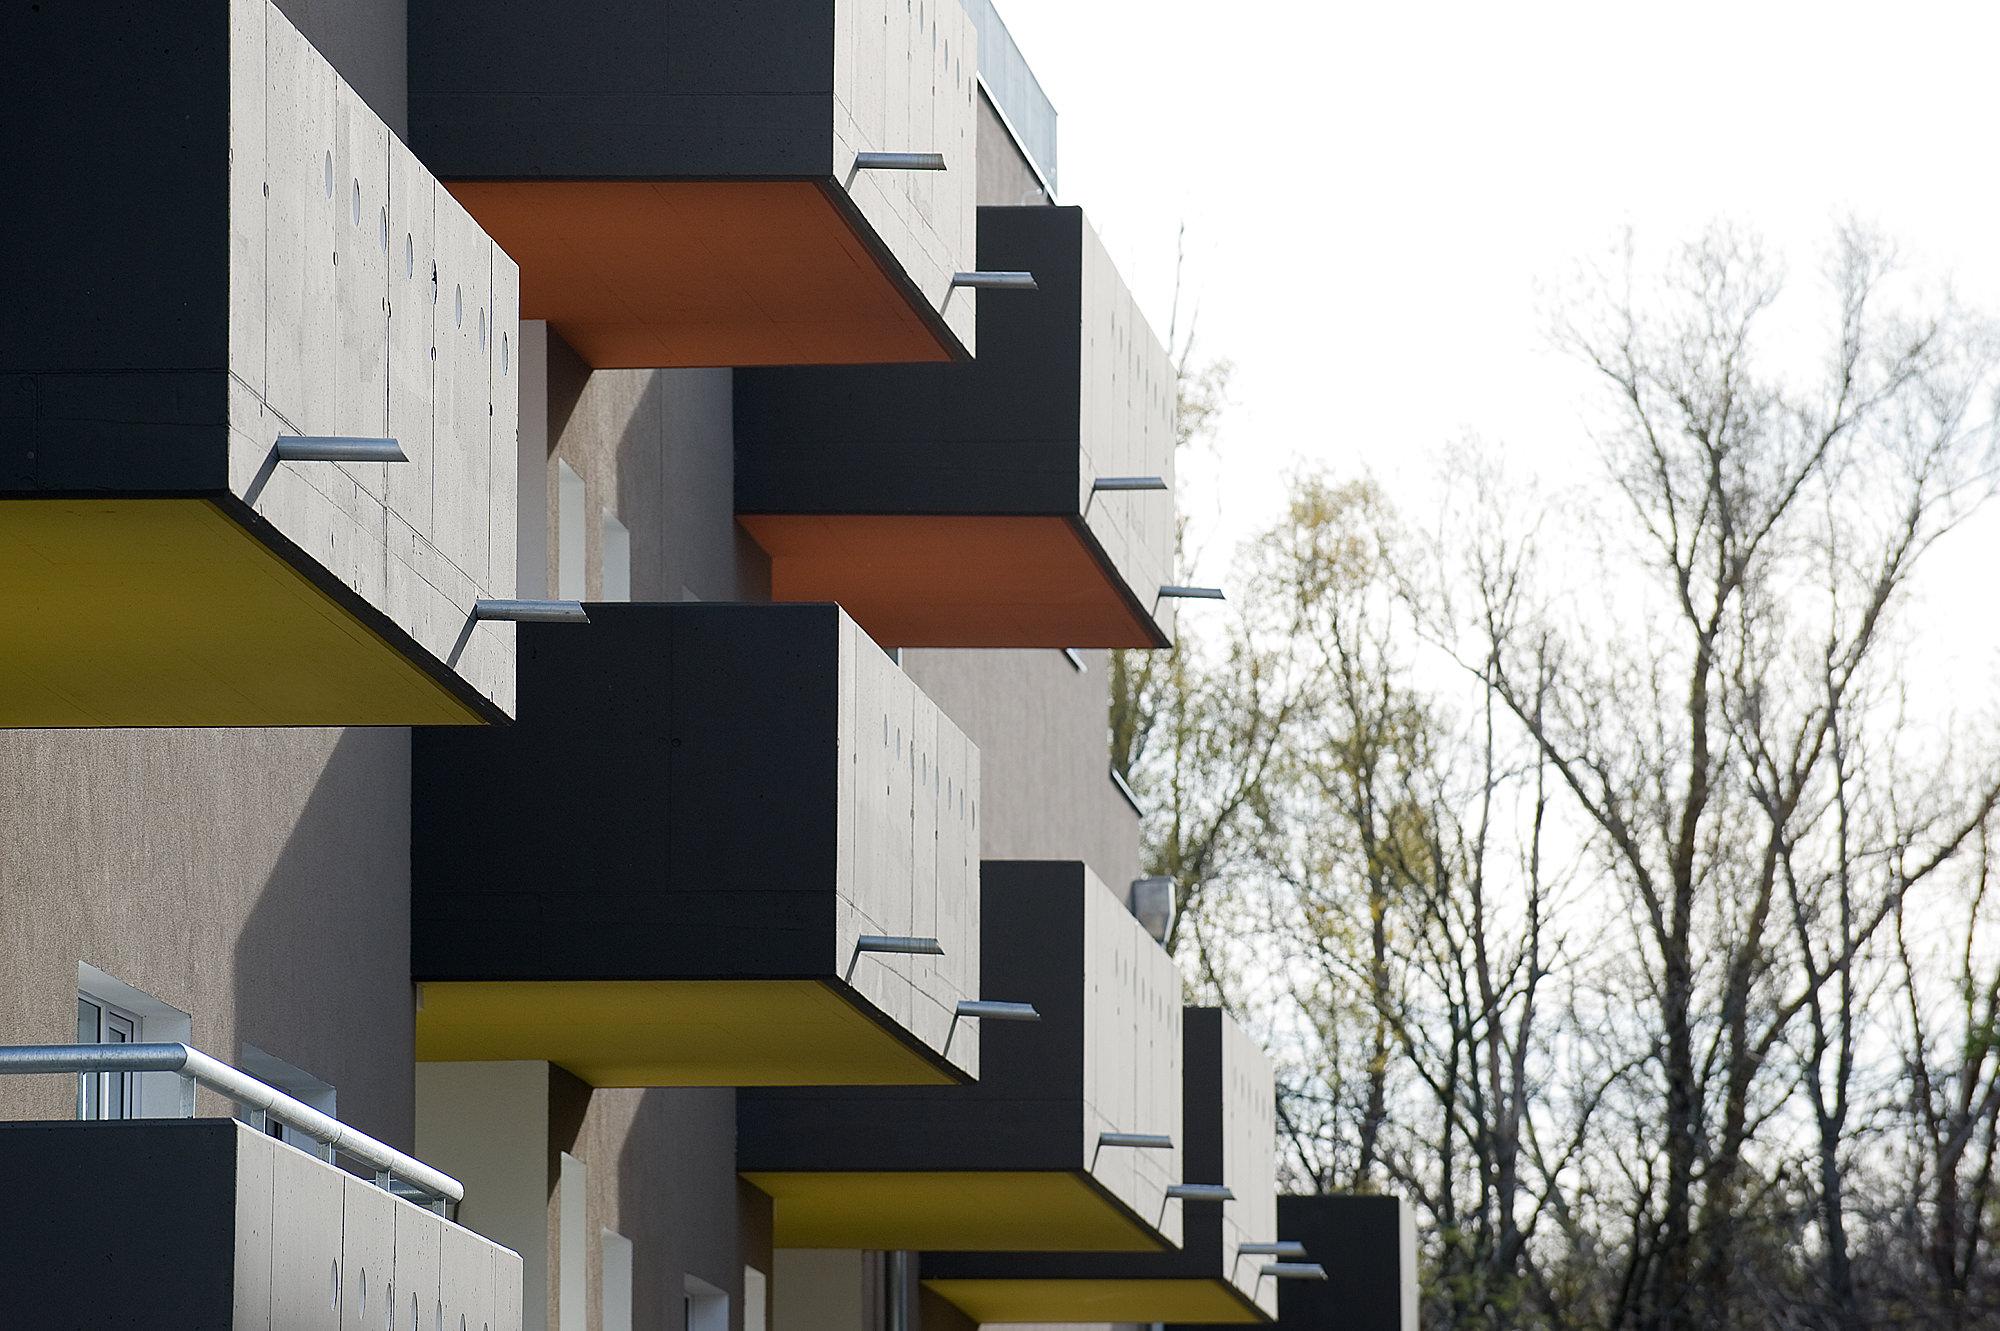 moselgasse_01_wohnbau_1100_wien_junger_beer_architektur